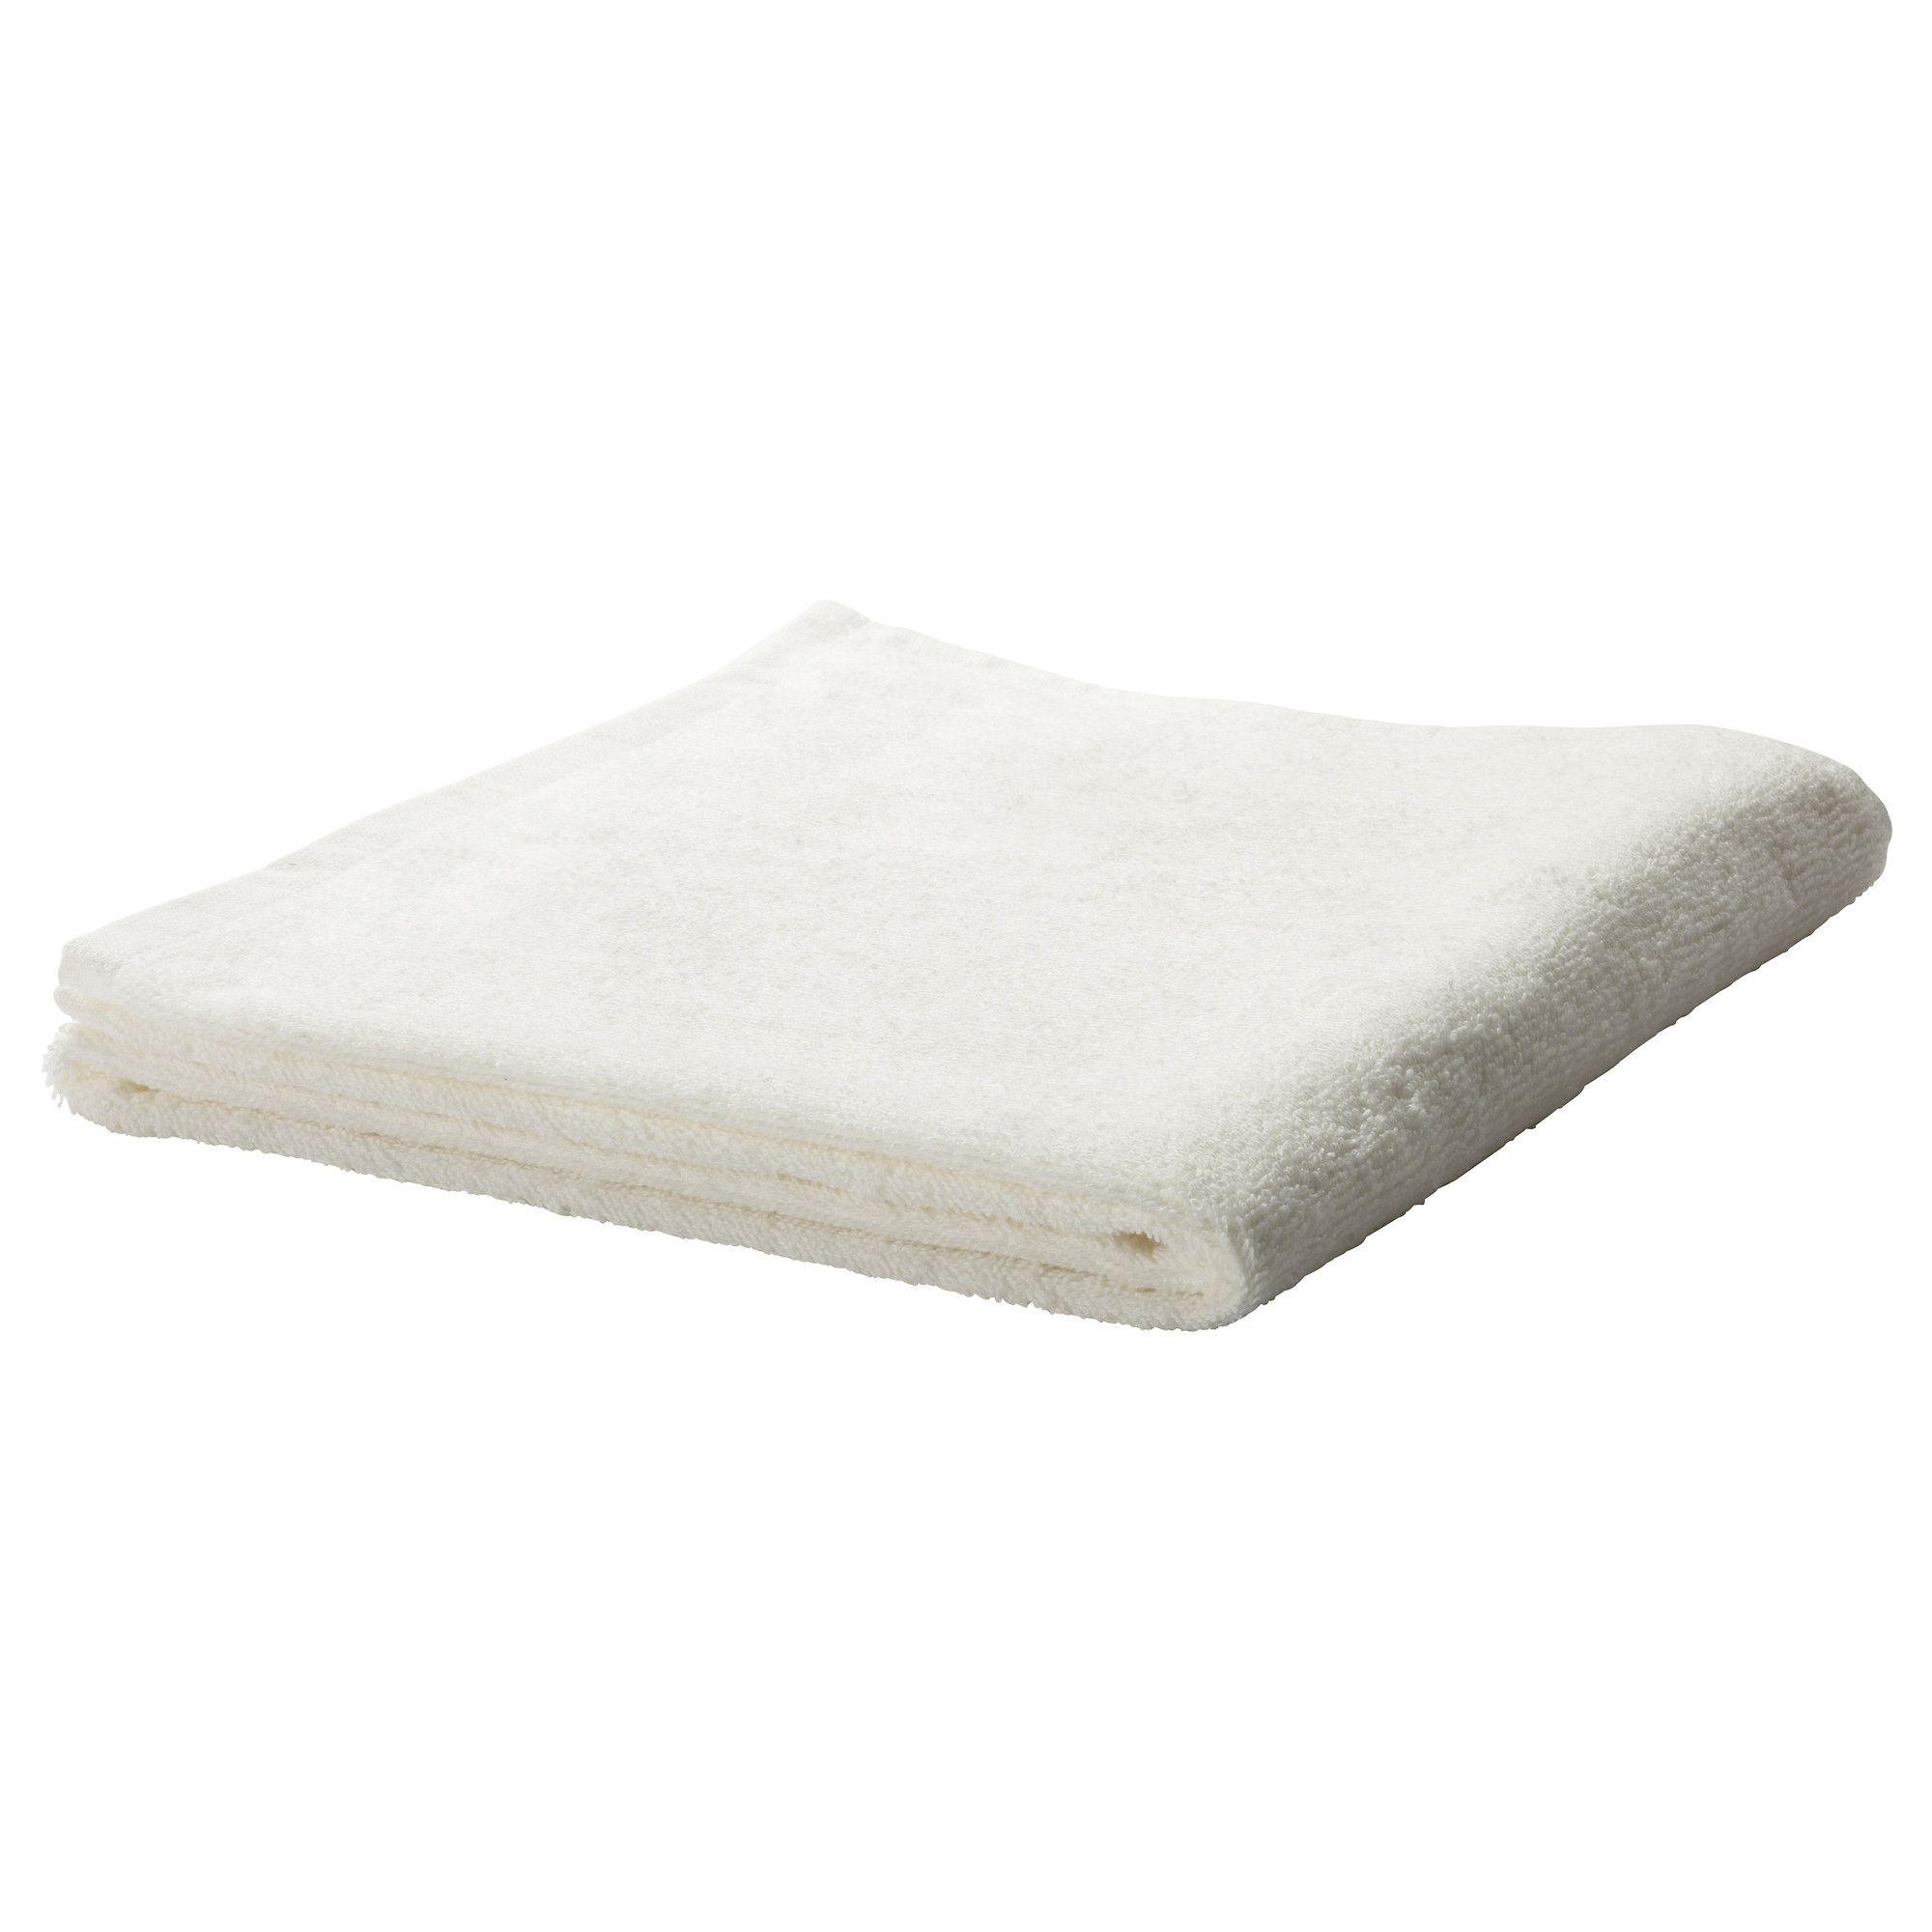 Ikea Us Furniture And Home Furnishings Ikea Towels Hand